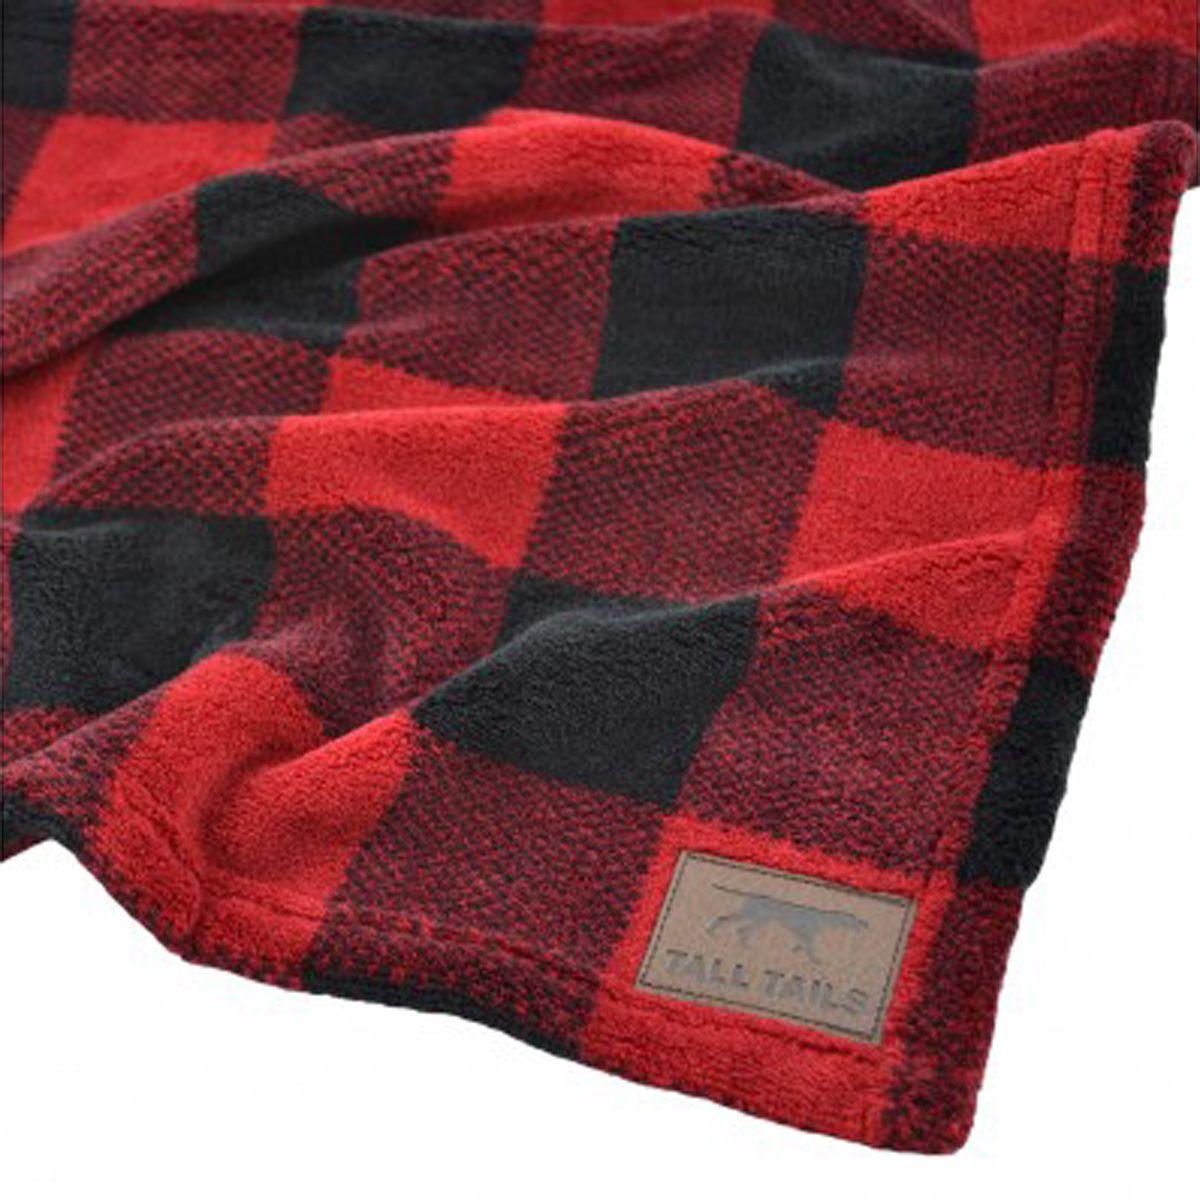 Tall Tails Fleece Dog Blanket Hunters Plaid Dog